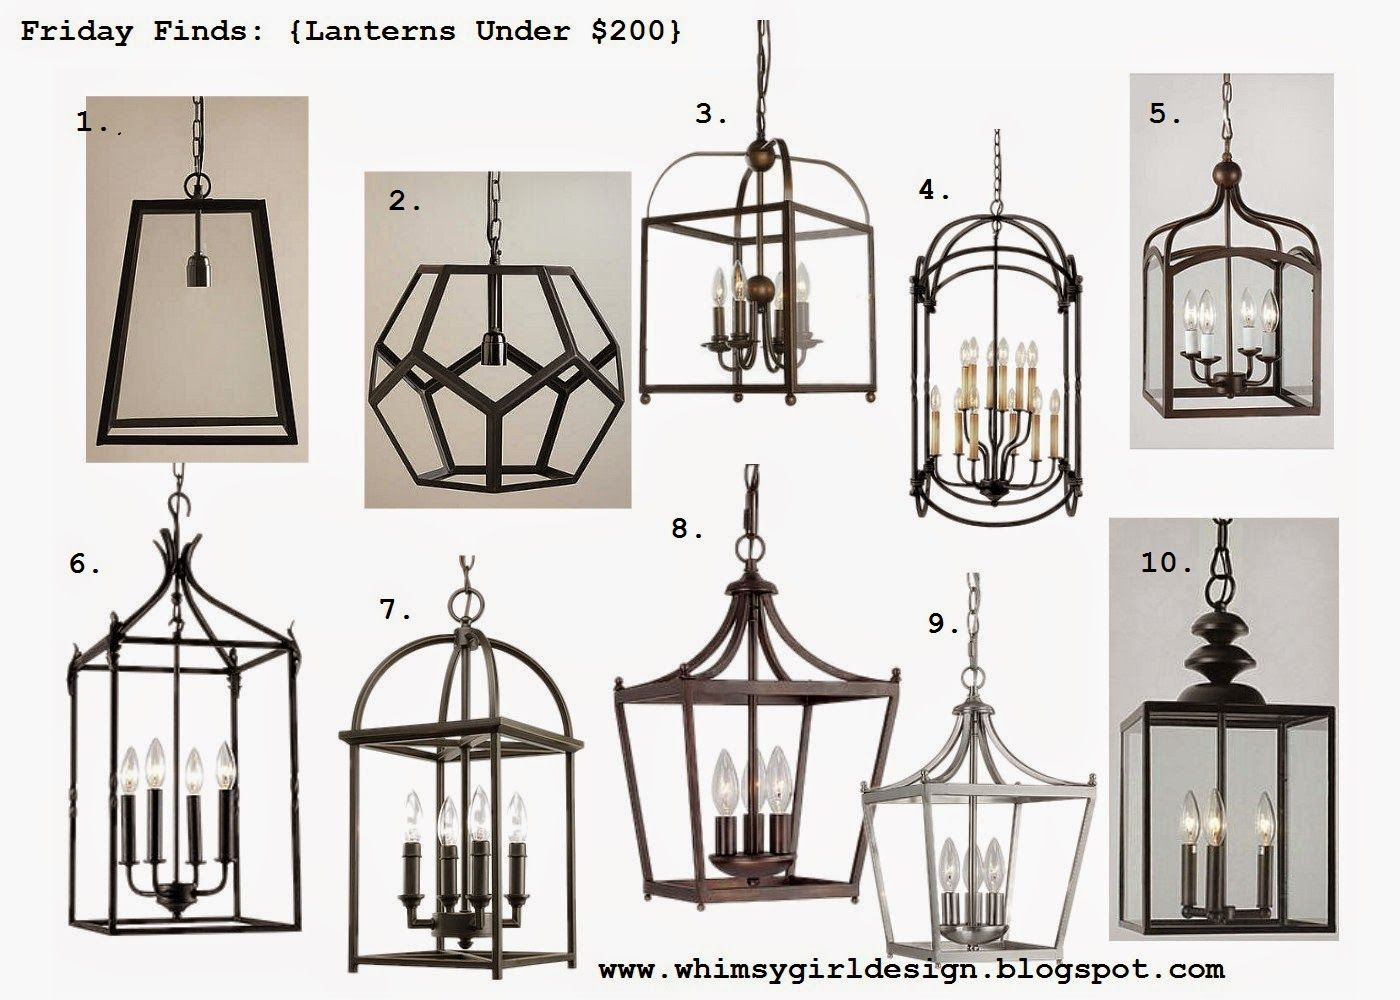 Crest 4 Light Lantern Pendant Reviews Birch Lane Kitchen Lights Over Island Lantern Pendant Lighting Farmhouse Lighting